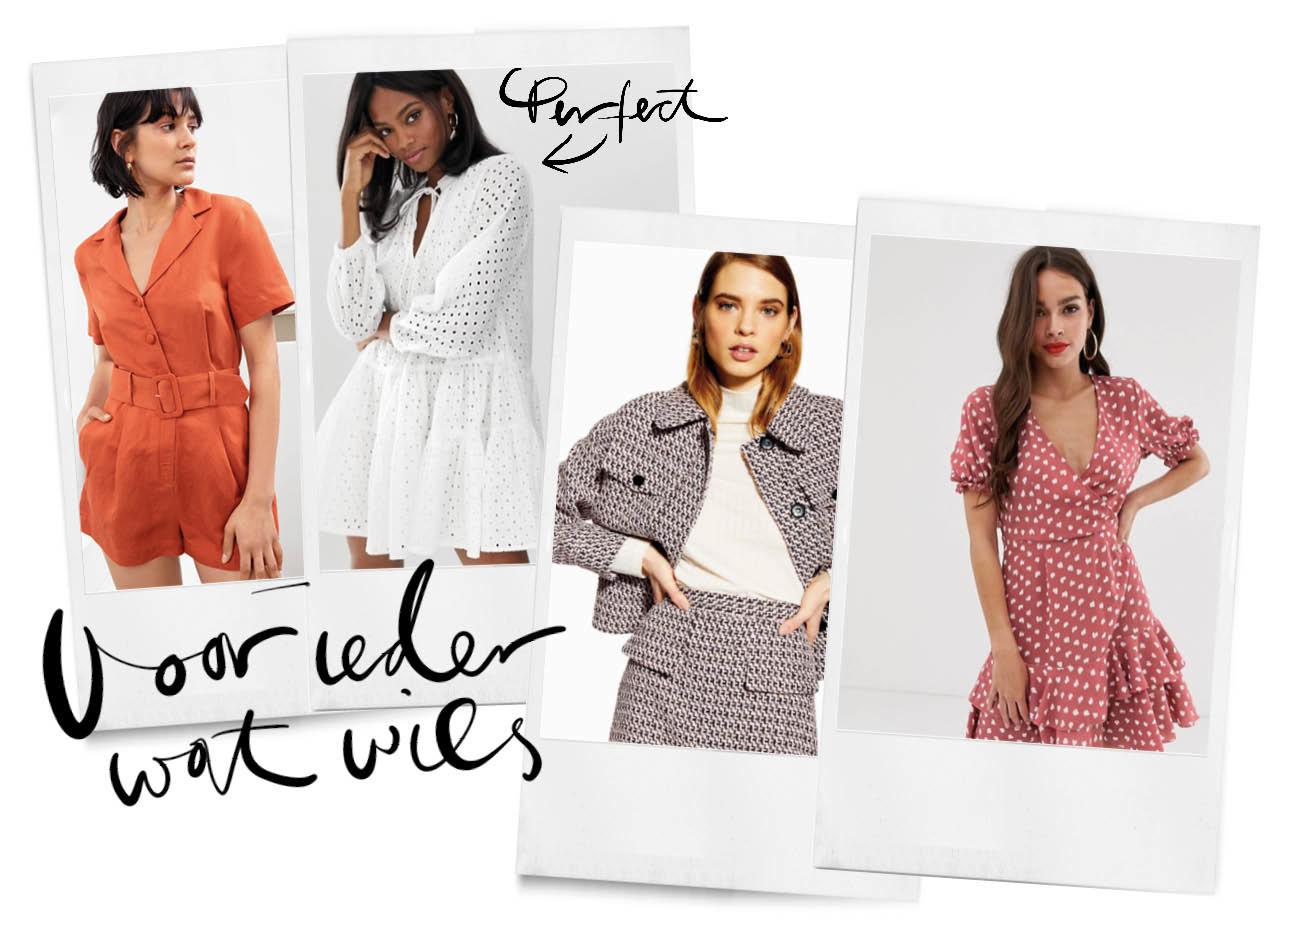 modellen in verschillende outfits die je kan shoppen